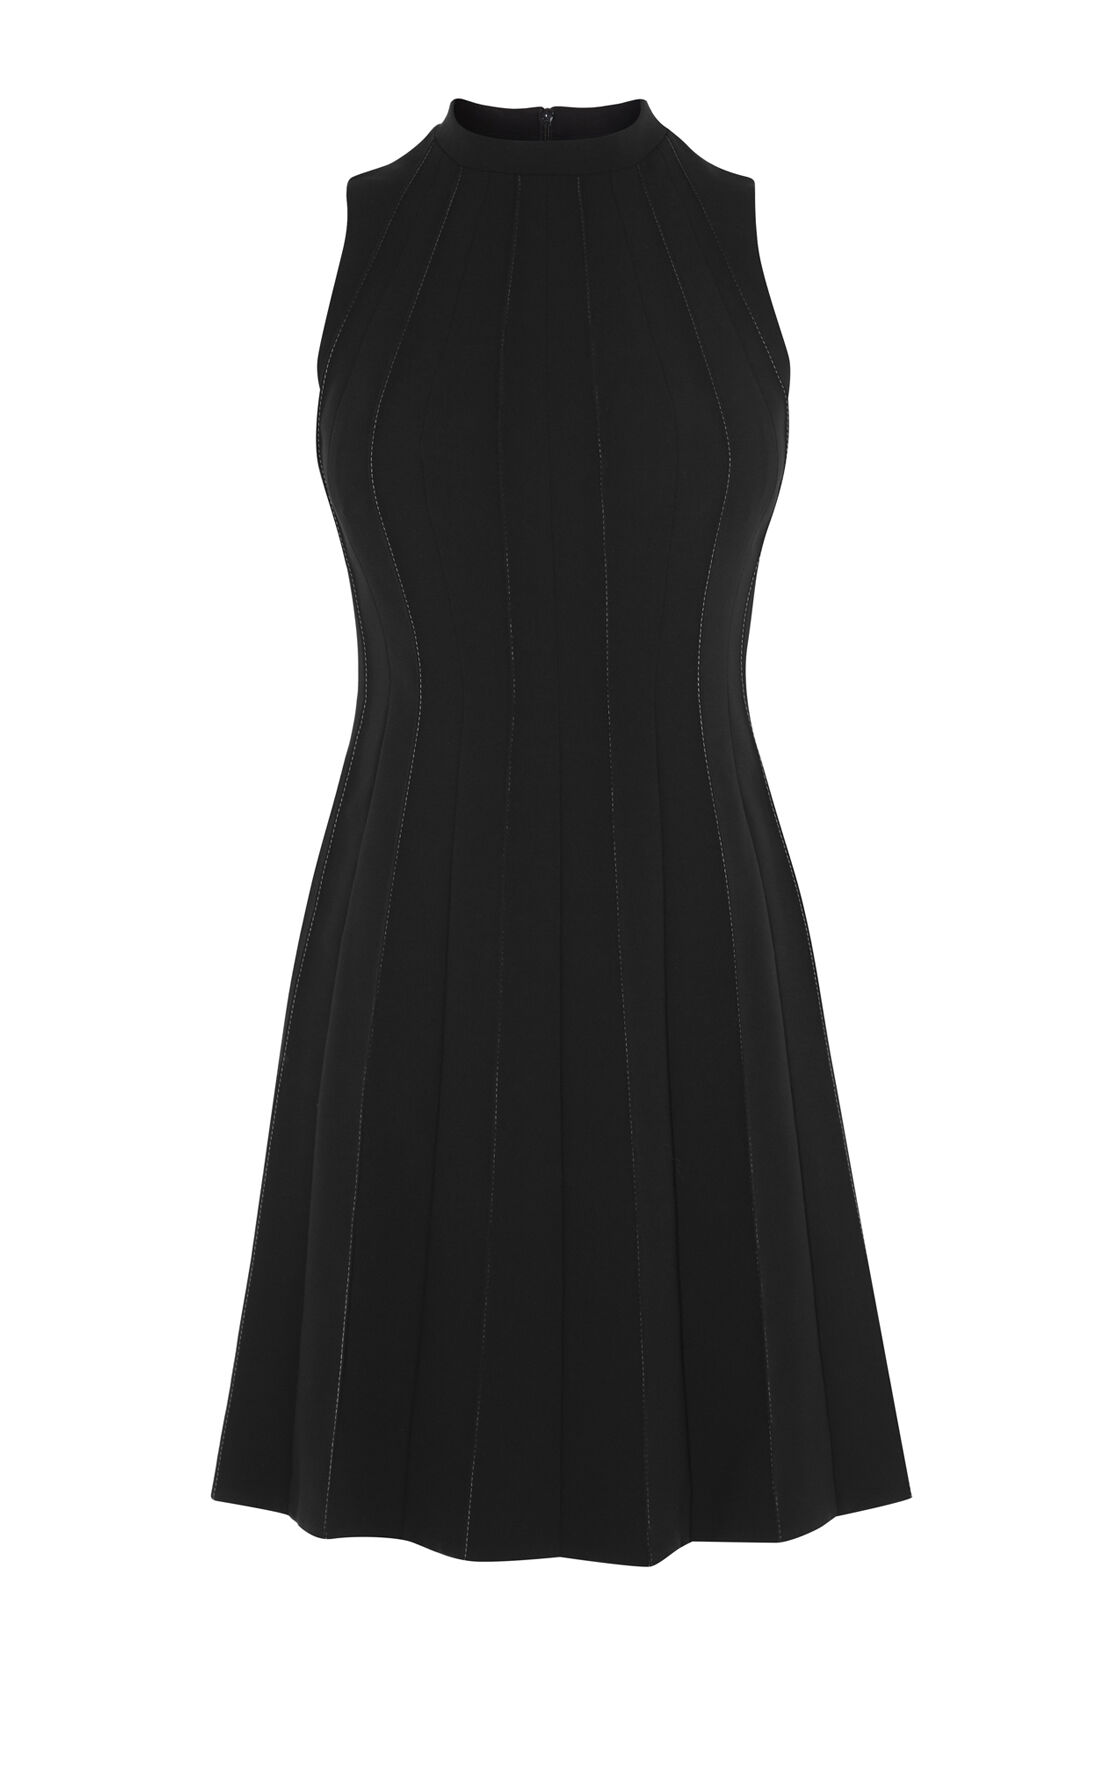 Karen Millen, SEAM-DETAIL DRESS Black 0